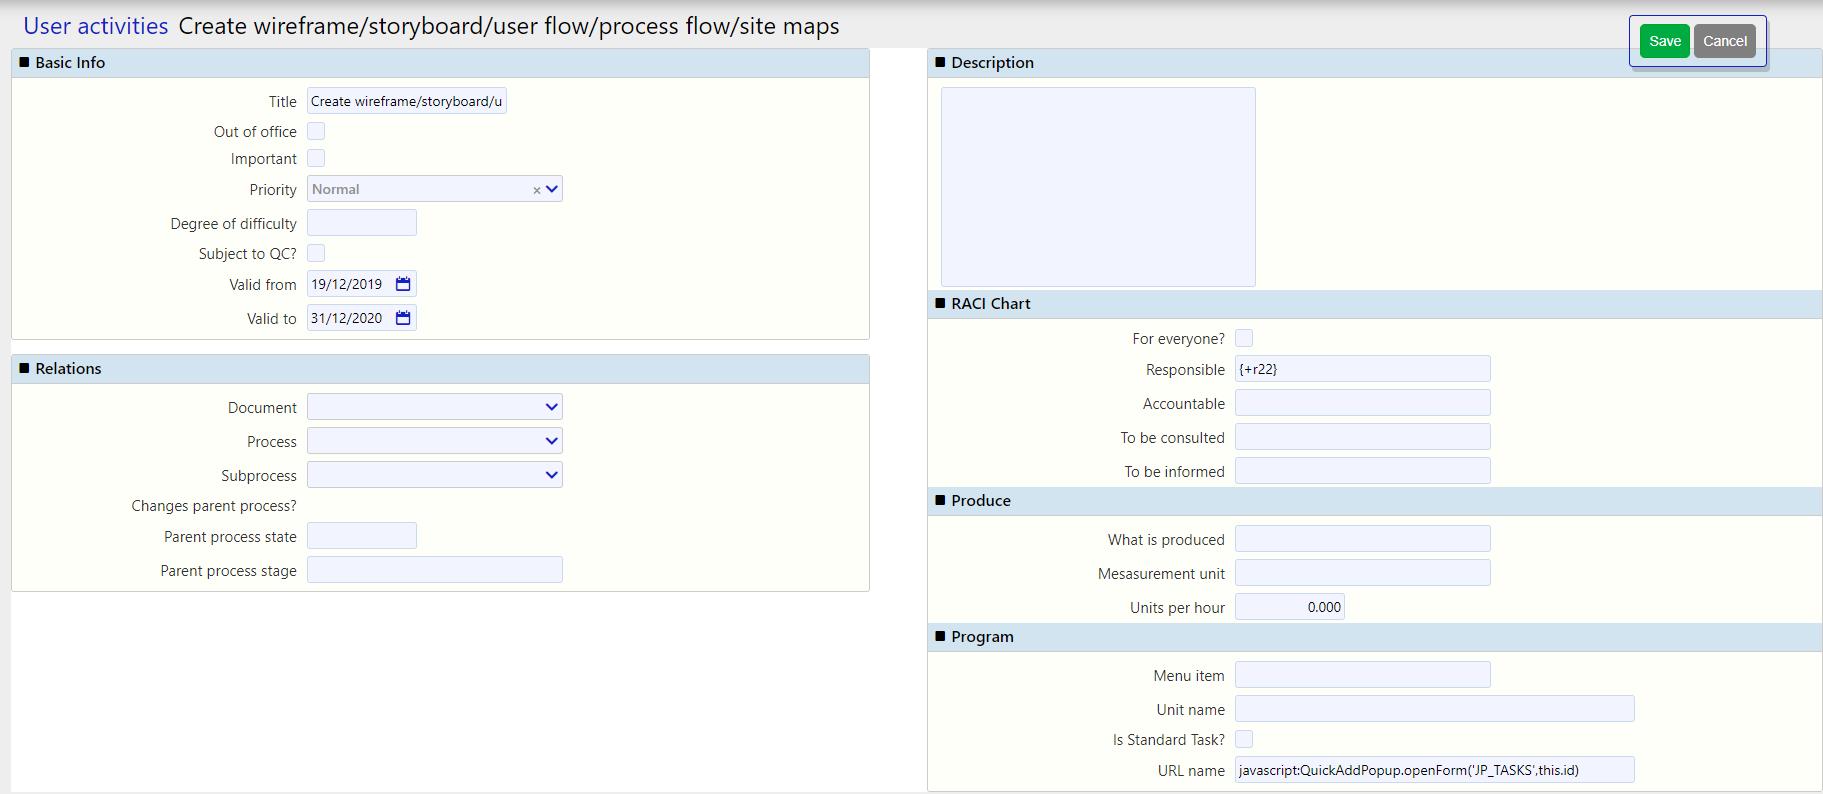 user activities / Comidor Digital Automation Platform